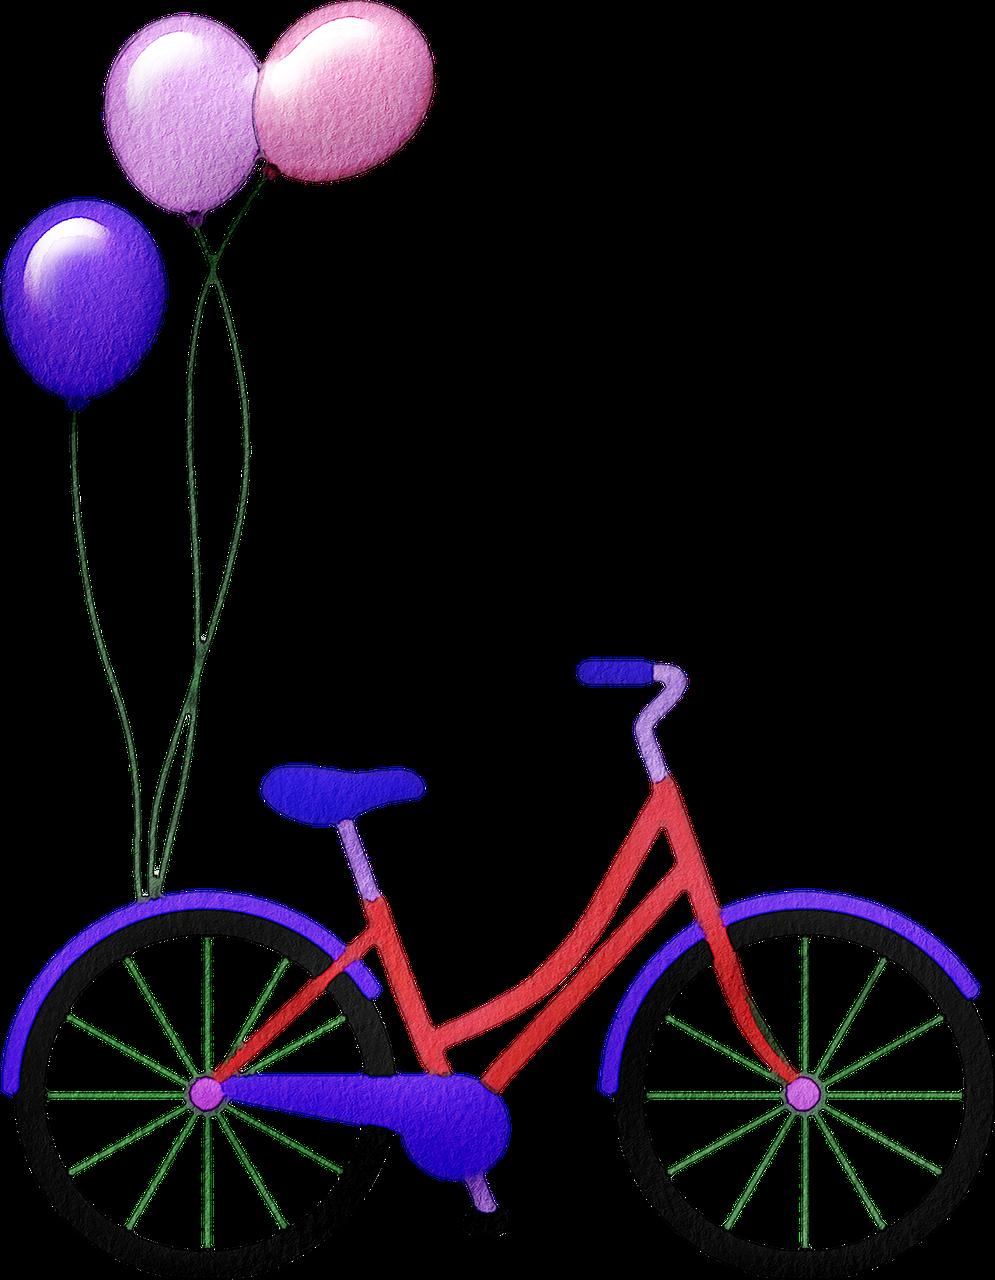 bicycle, bike, balloons